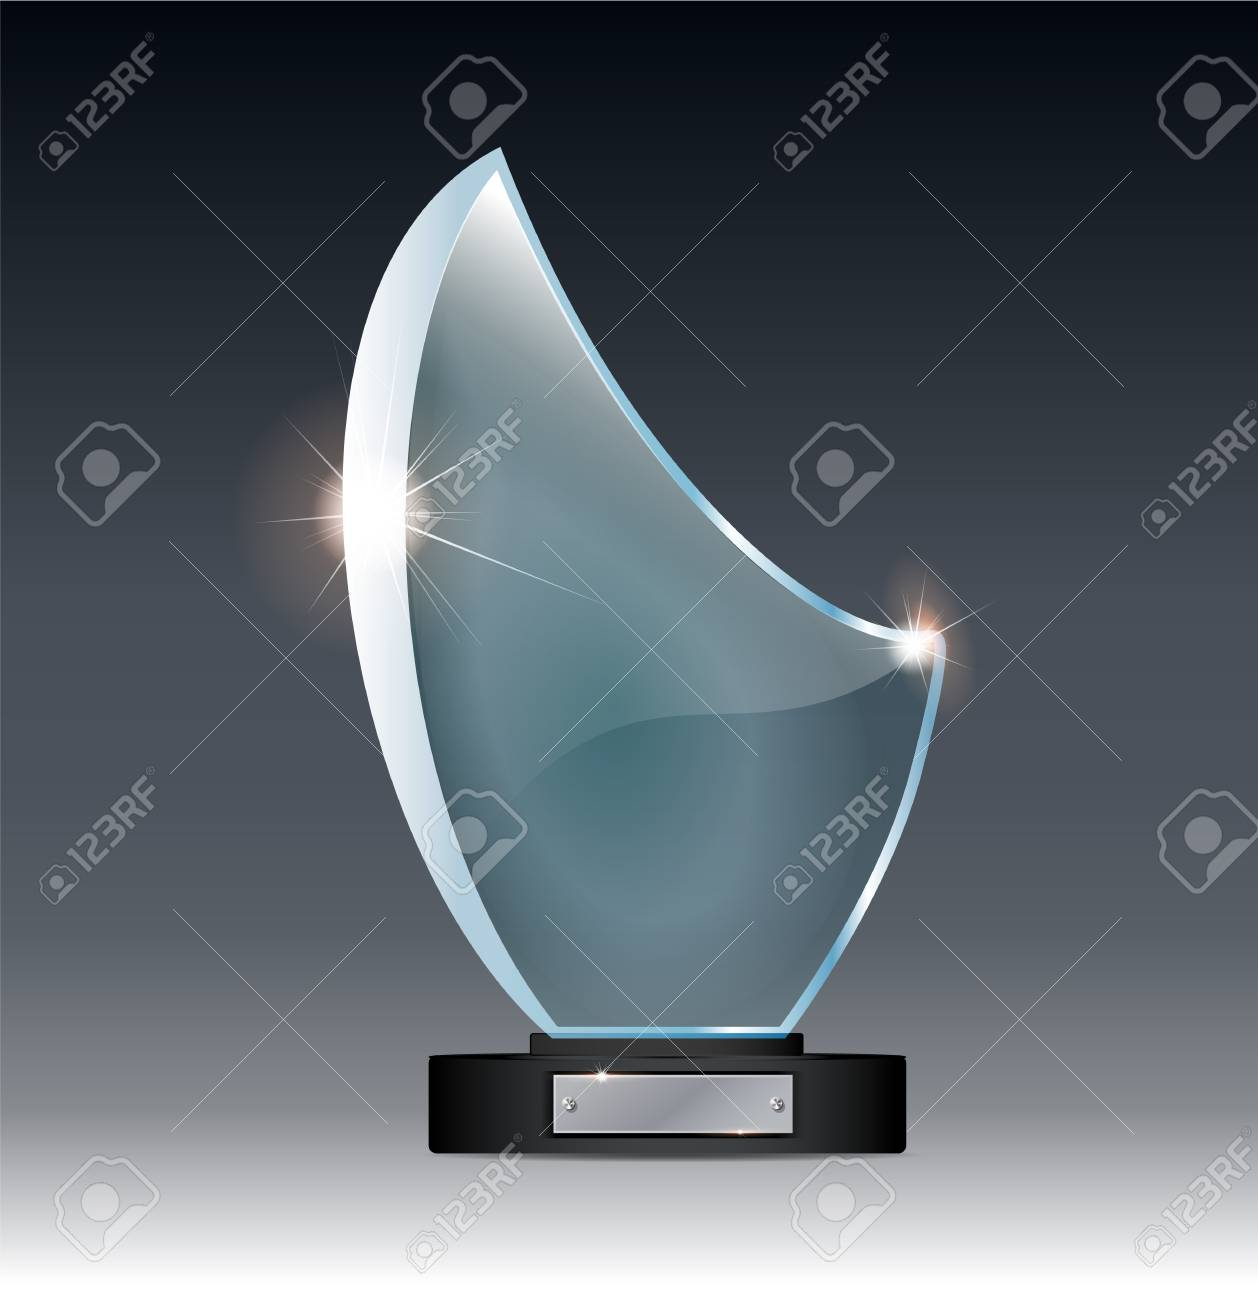 Blank Tall Glass Trophy Mockup Empty Acrylic Award Design Mock Up Transparent Crystal Prize